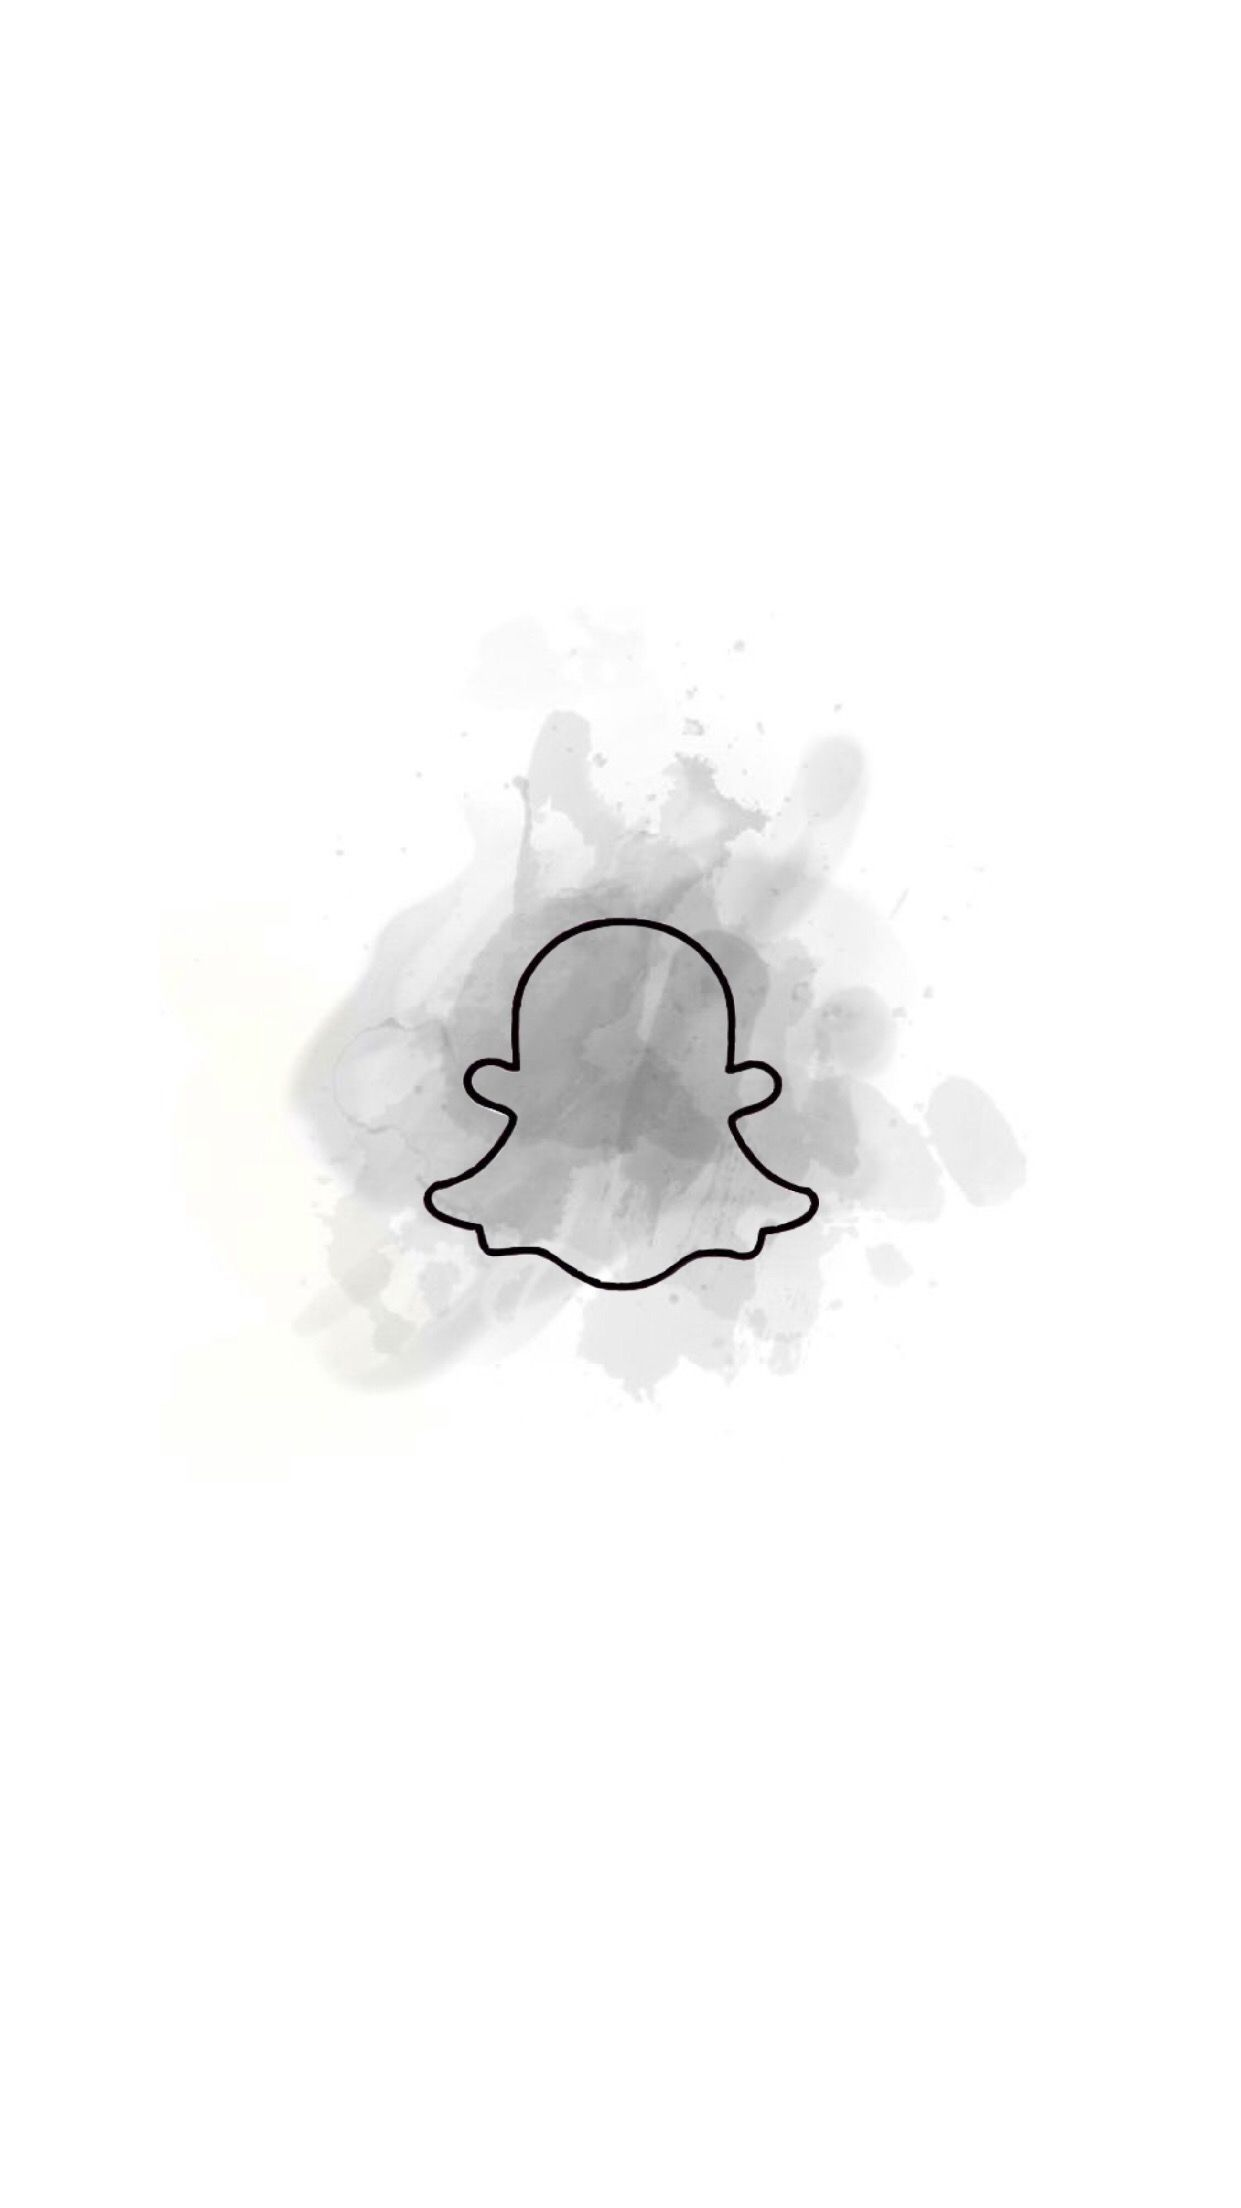 White Aesthetic Snapchat Logo